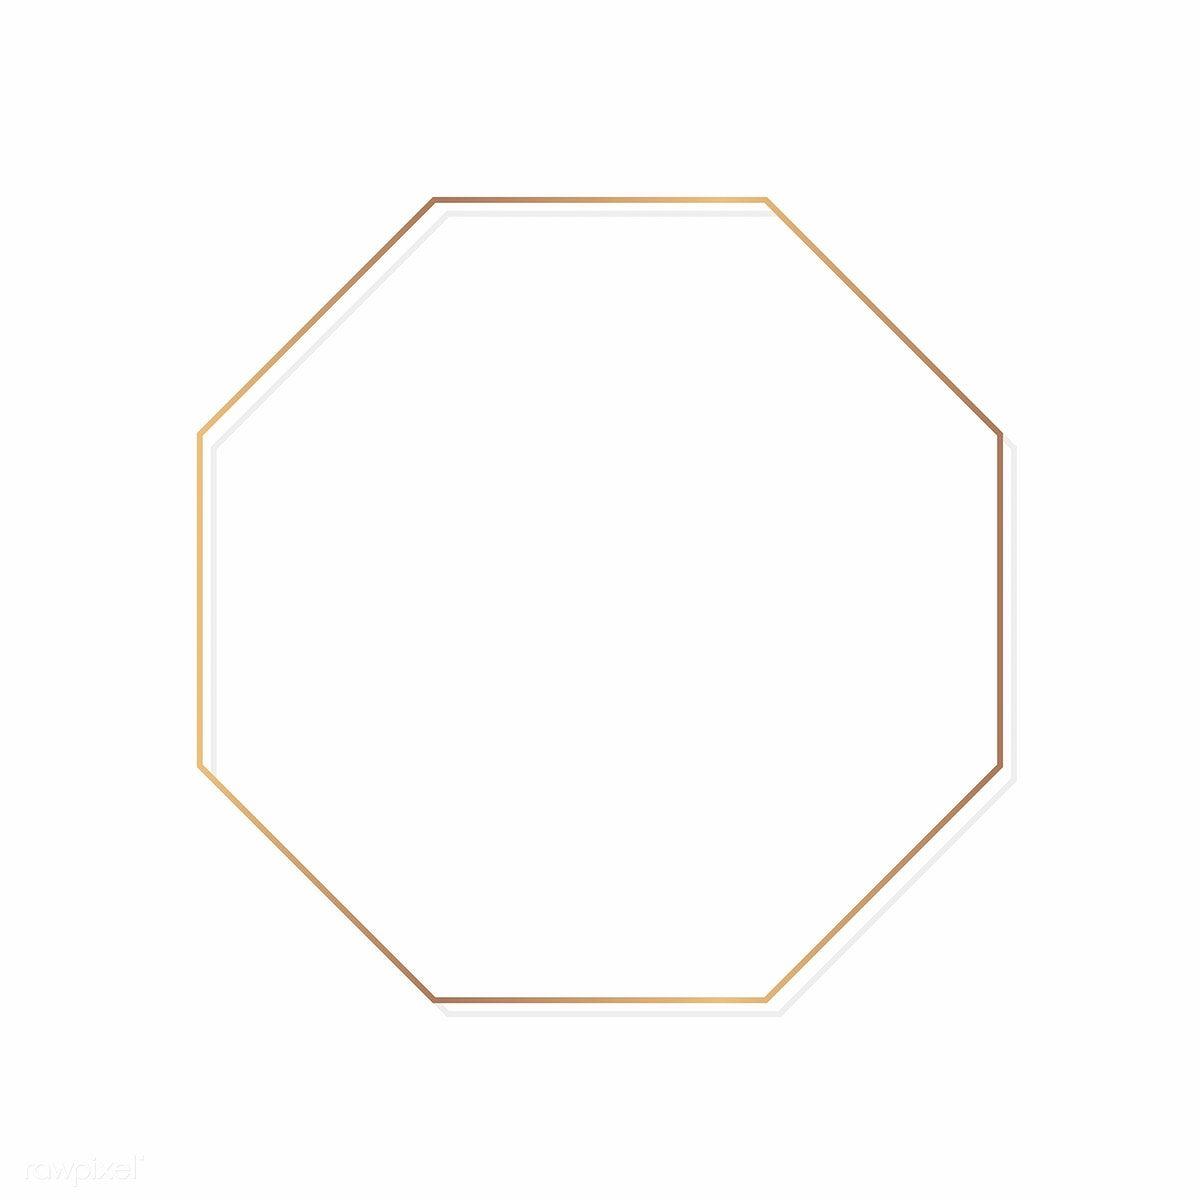 Download Premium Vector Of Gold Octagon Frame On A Blank Background 1214811 Blank Background Octagon Frame Design